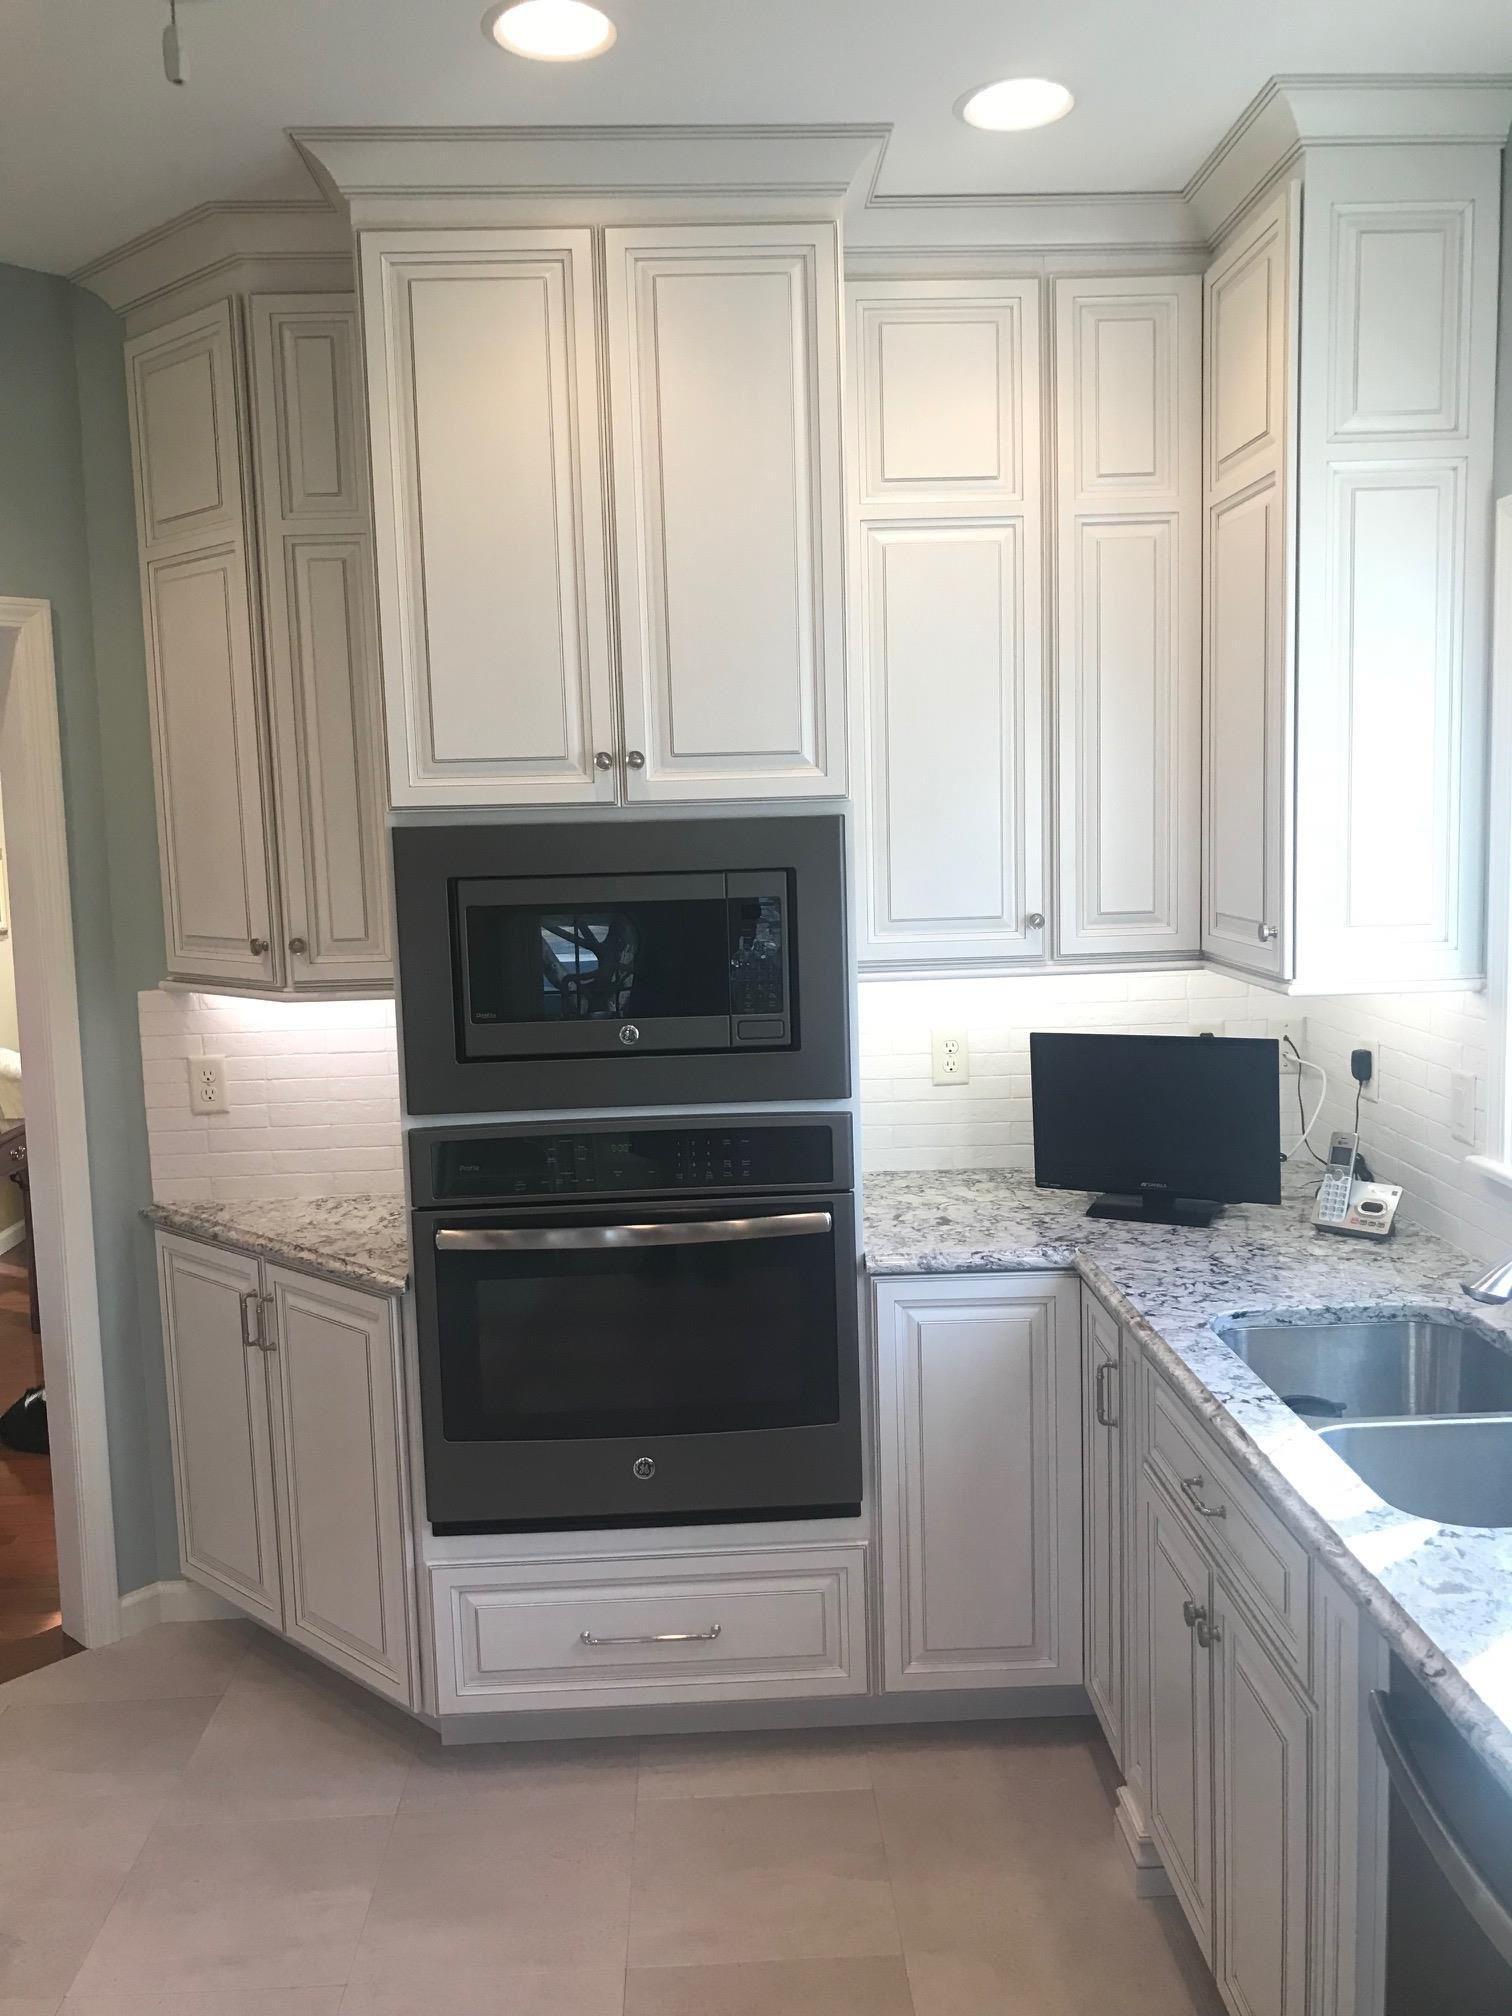 Kitchen Cabinets Bloomington Il 2020 In 2020 Kitchen Cabinets Cabinet Kitchen